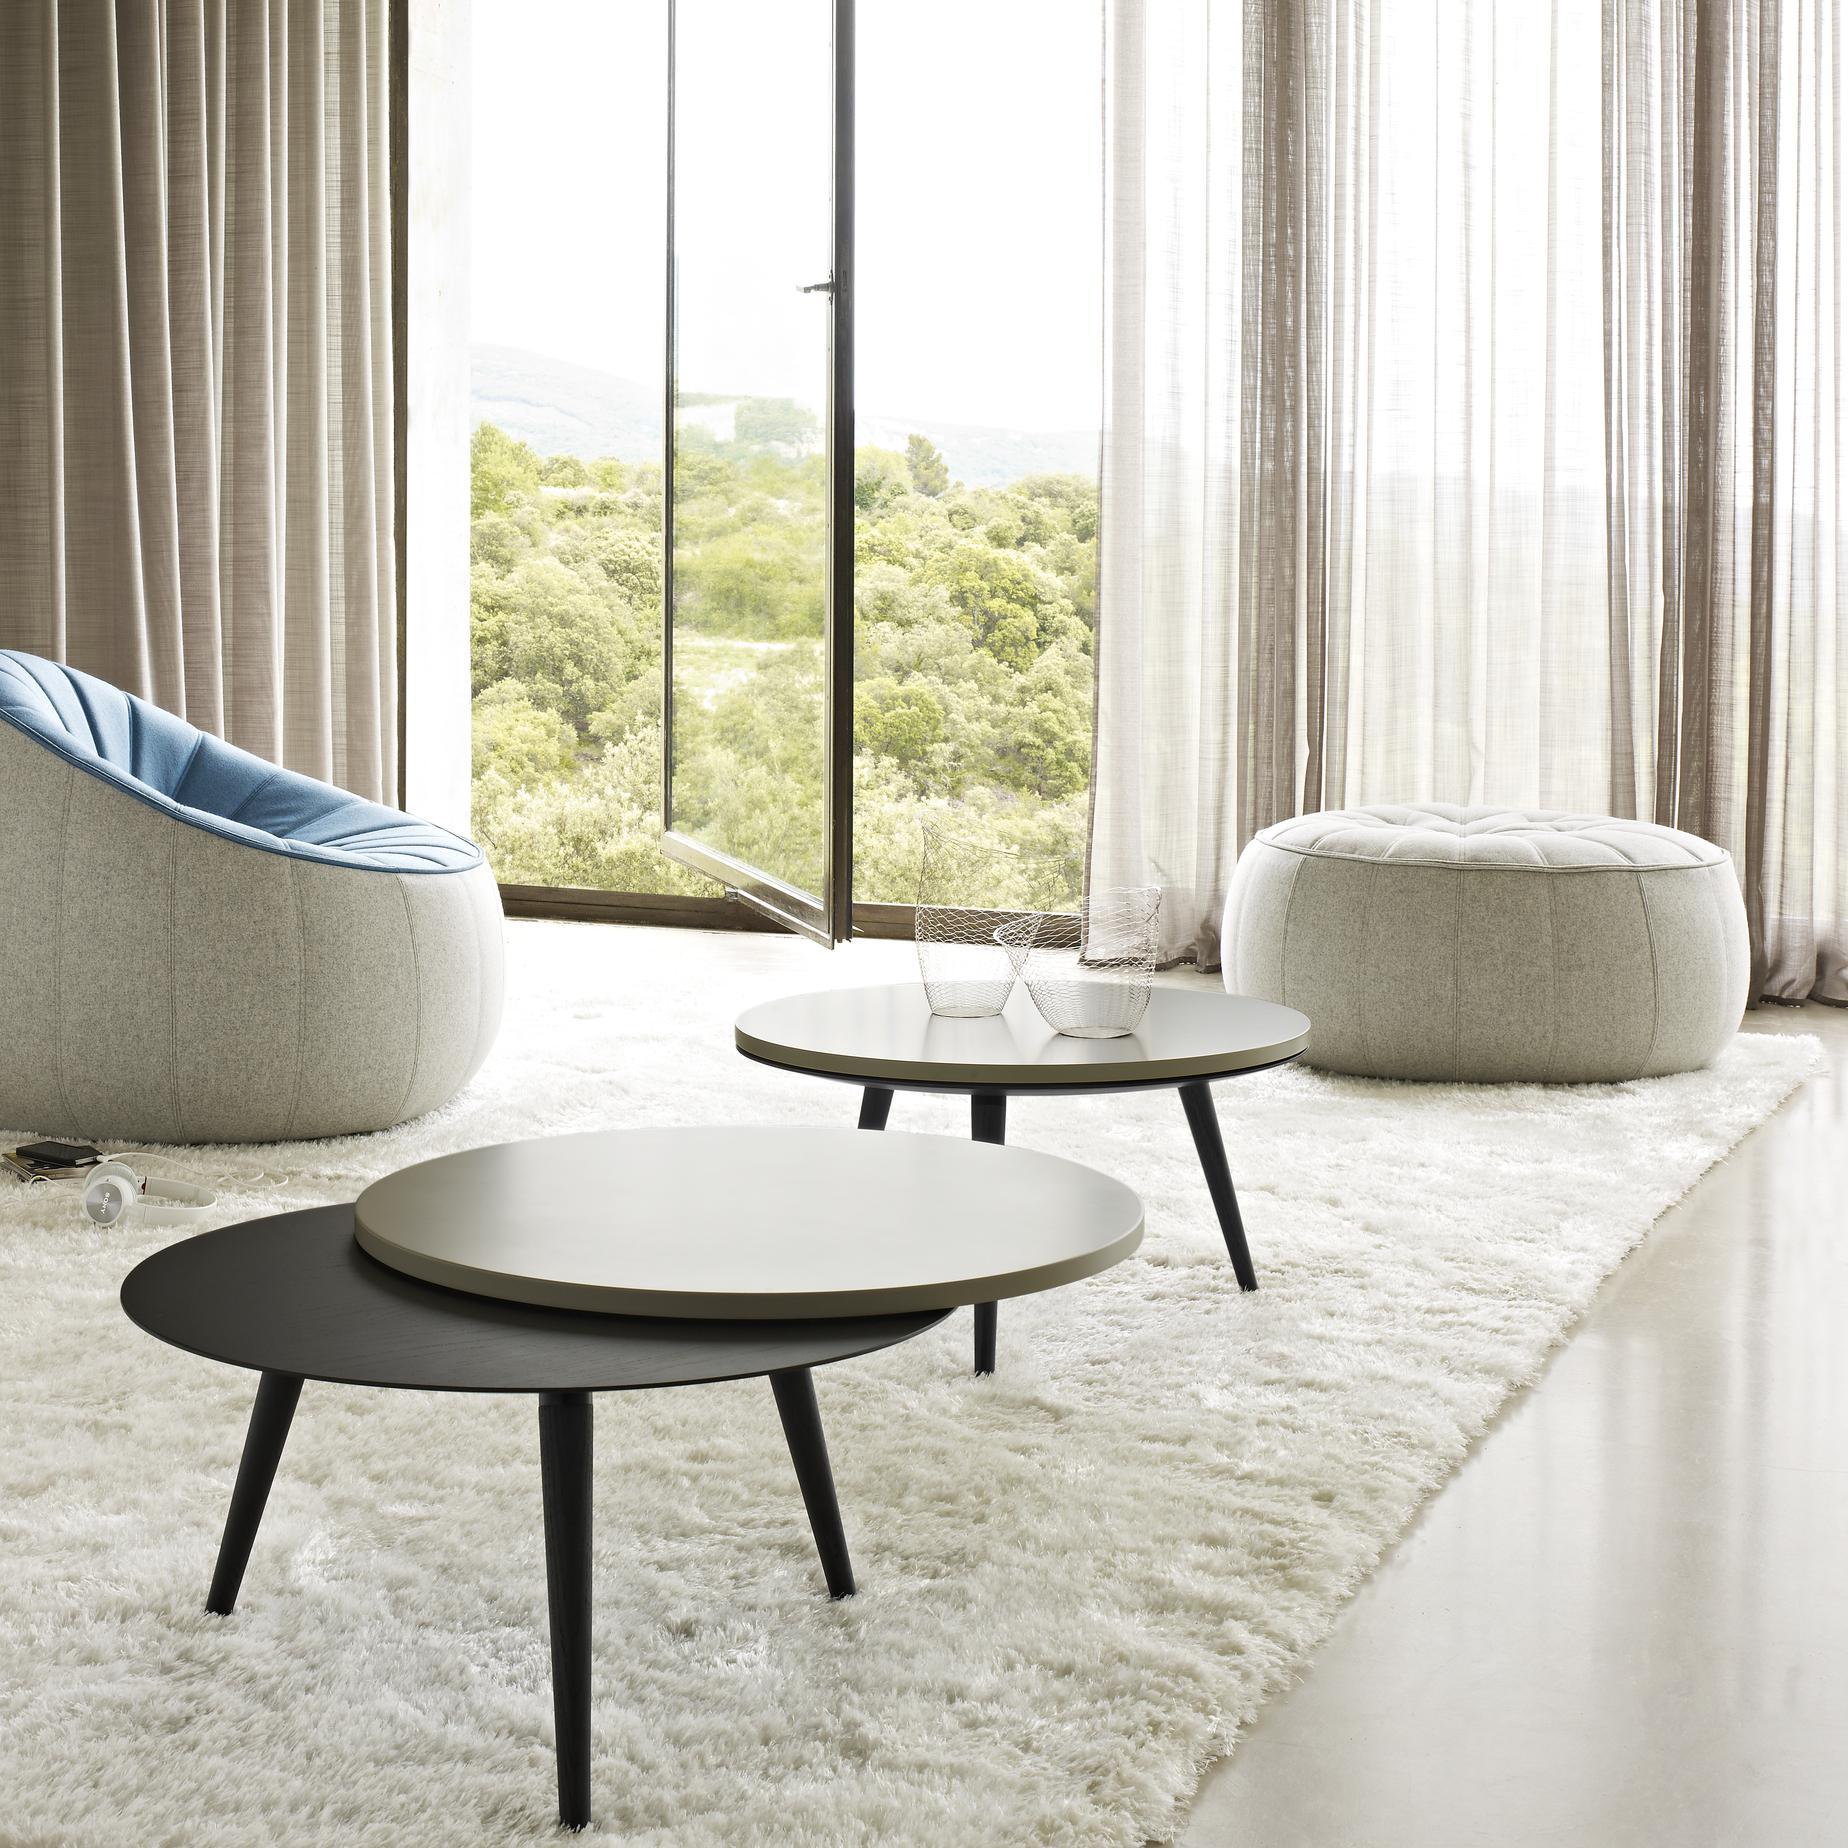 ottoman armchairs from designer no duchaufour lawrance. Black Bedroom Furniture Sets. Home Design Ideas